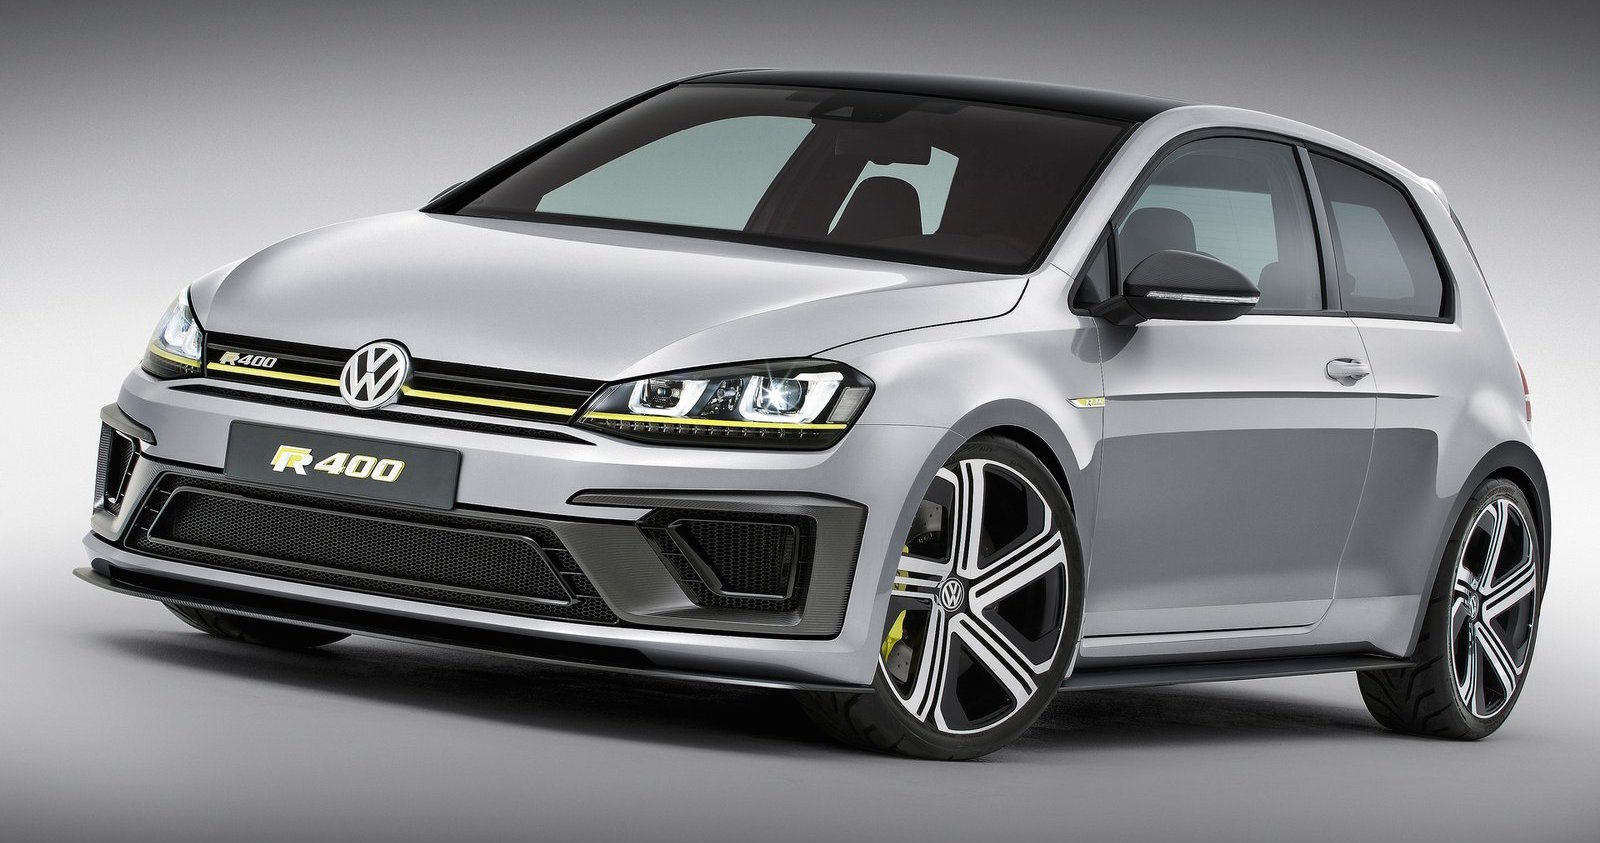 Volkswagen Golf R400 Concept 1